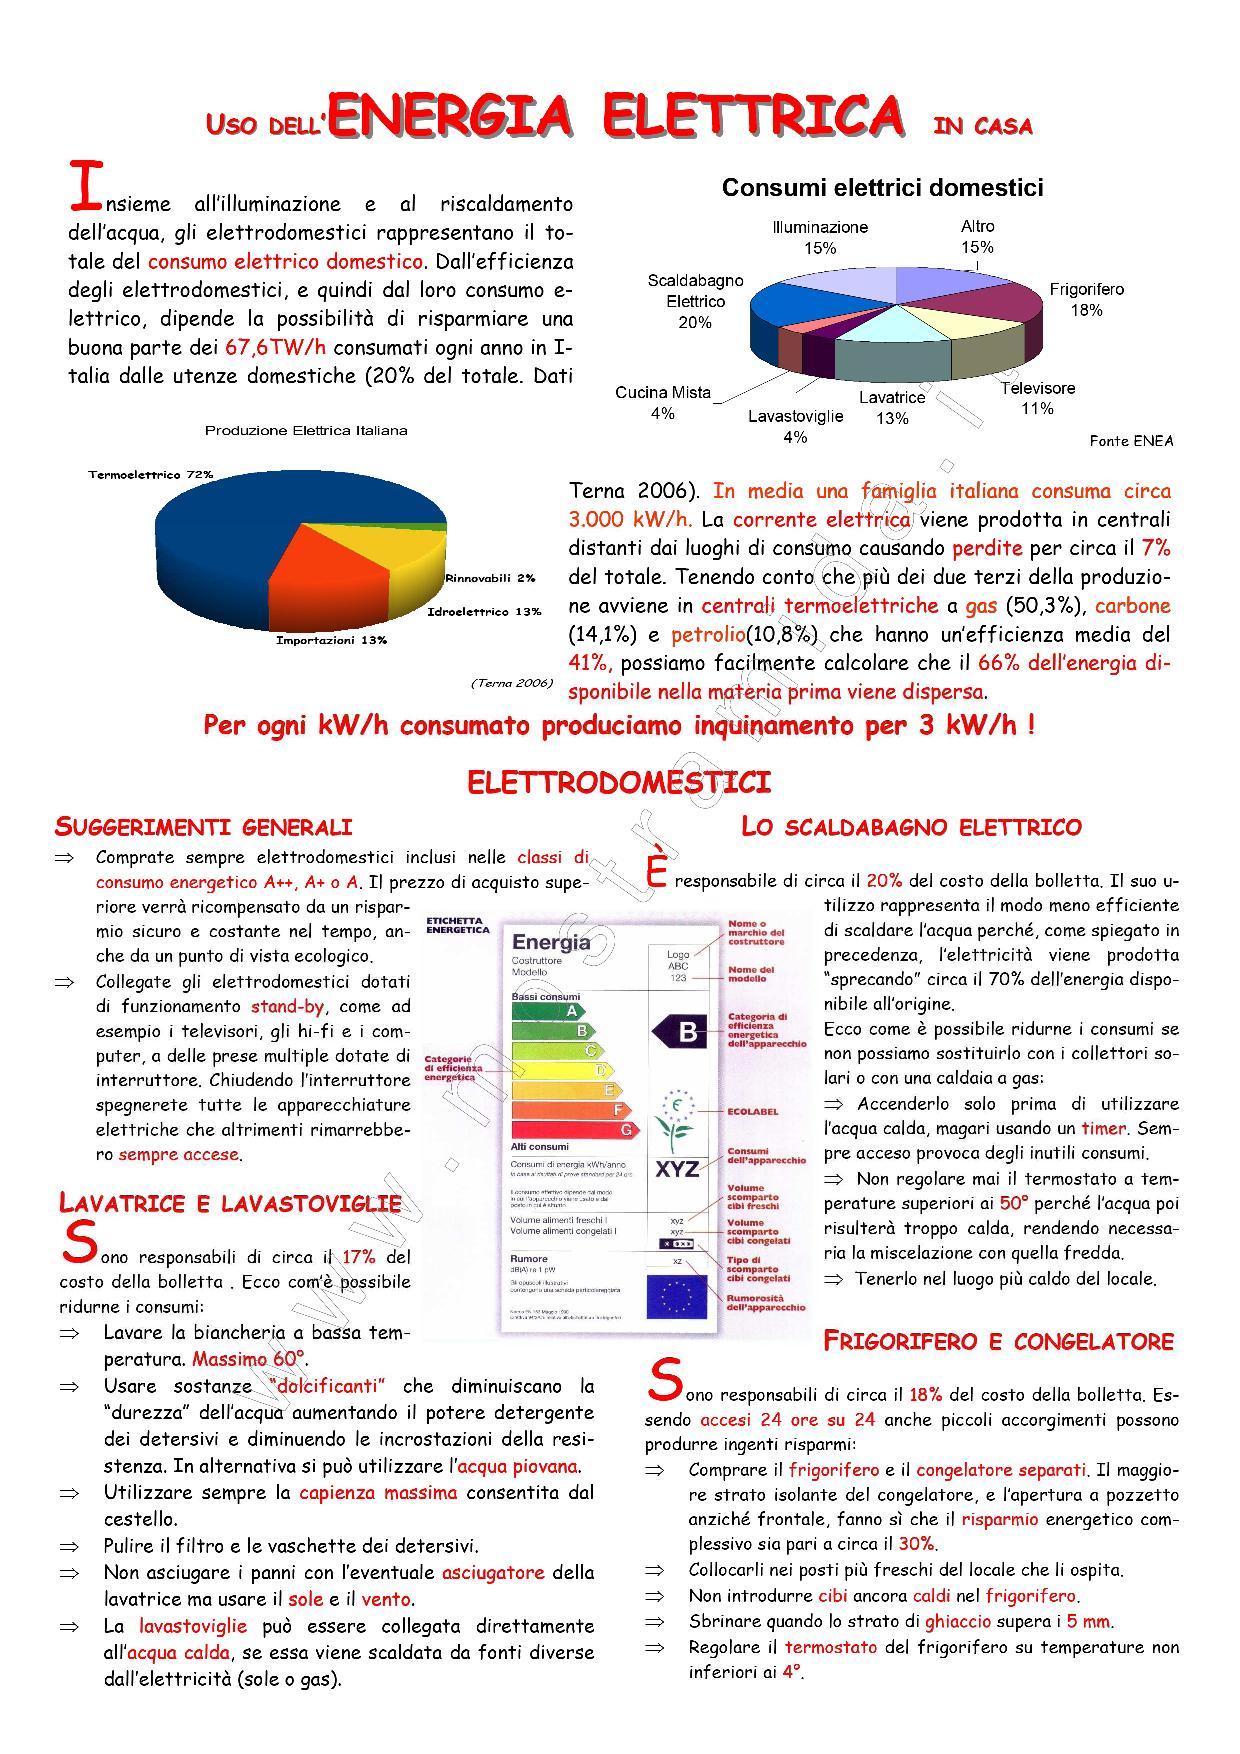 MIDA - risparmio energetico, elettrodomestici, consumi elettrici, ecolabel